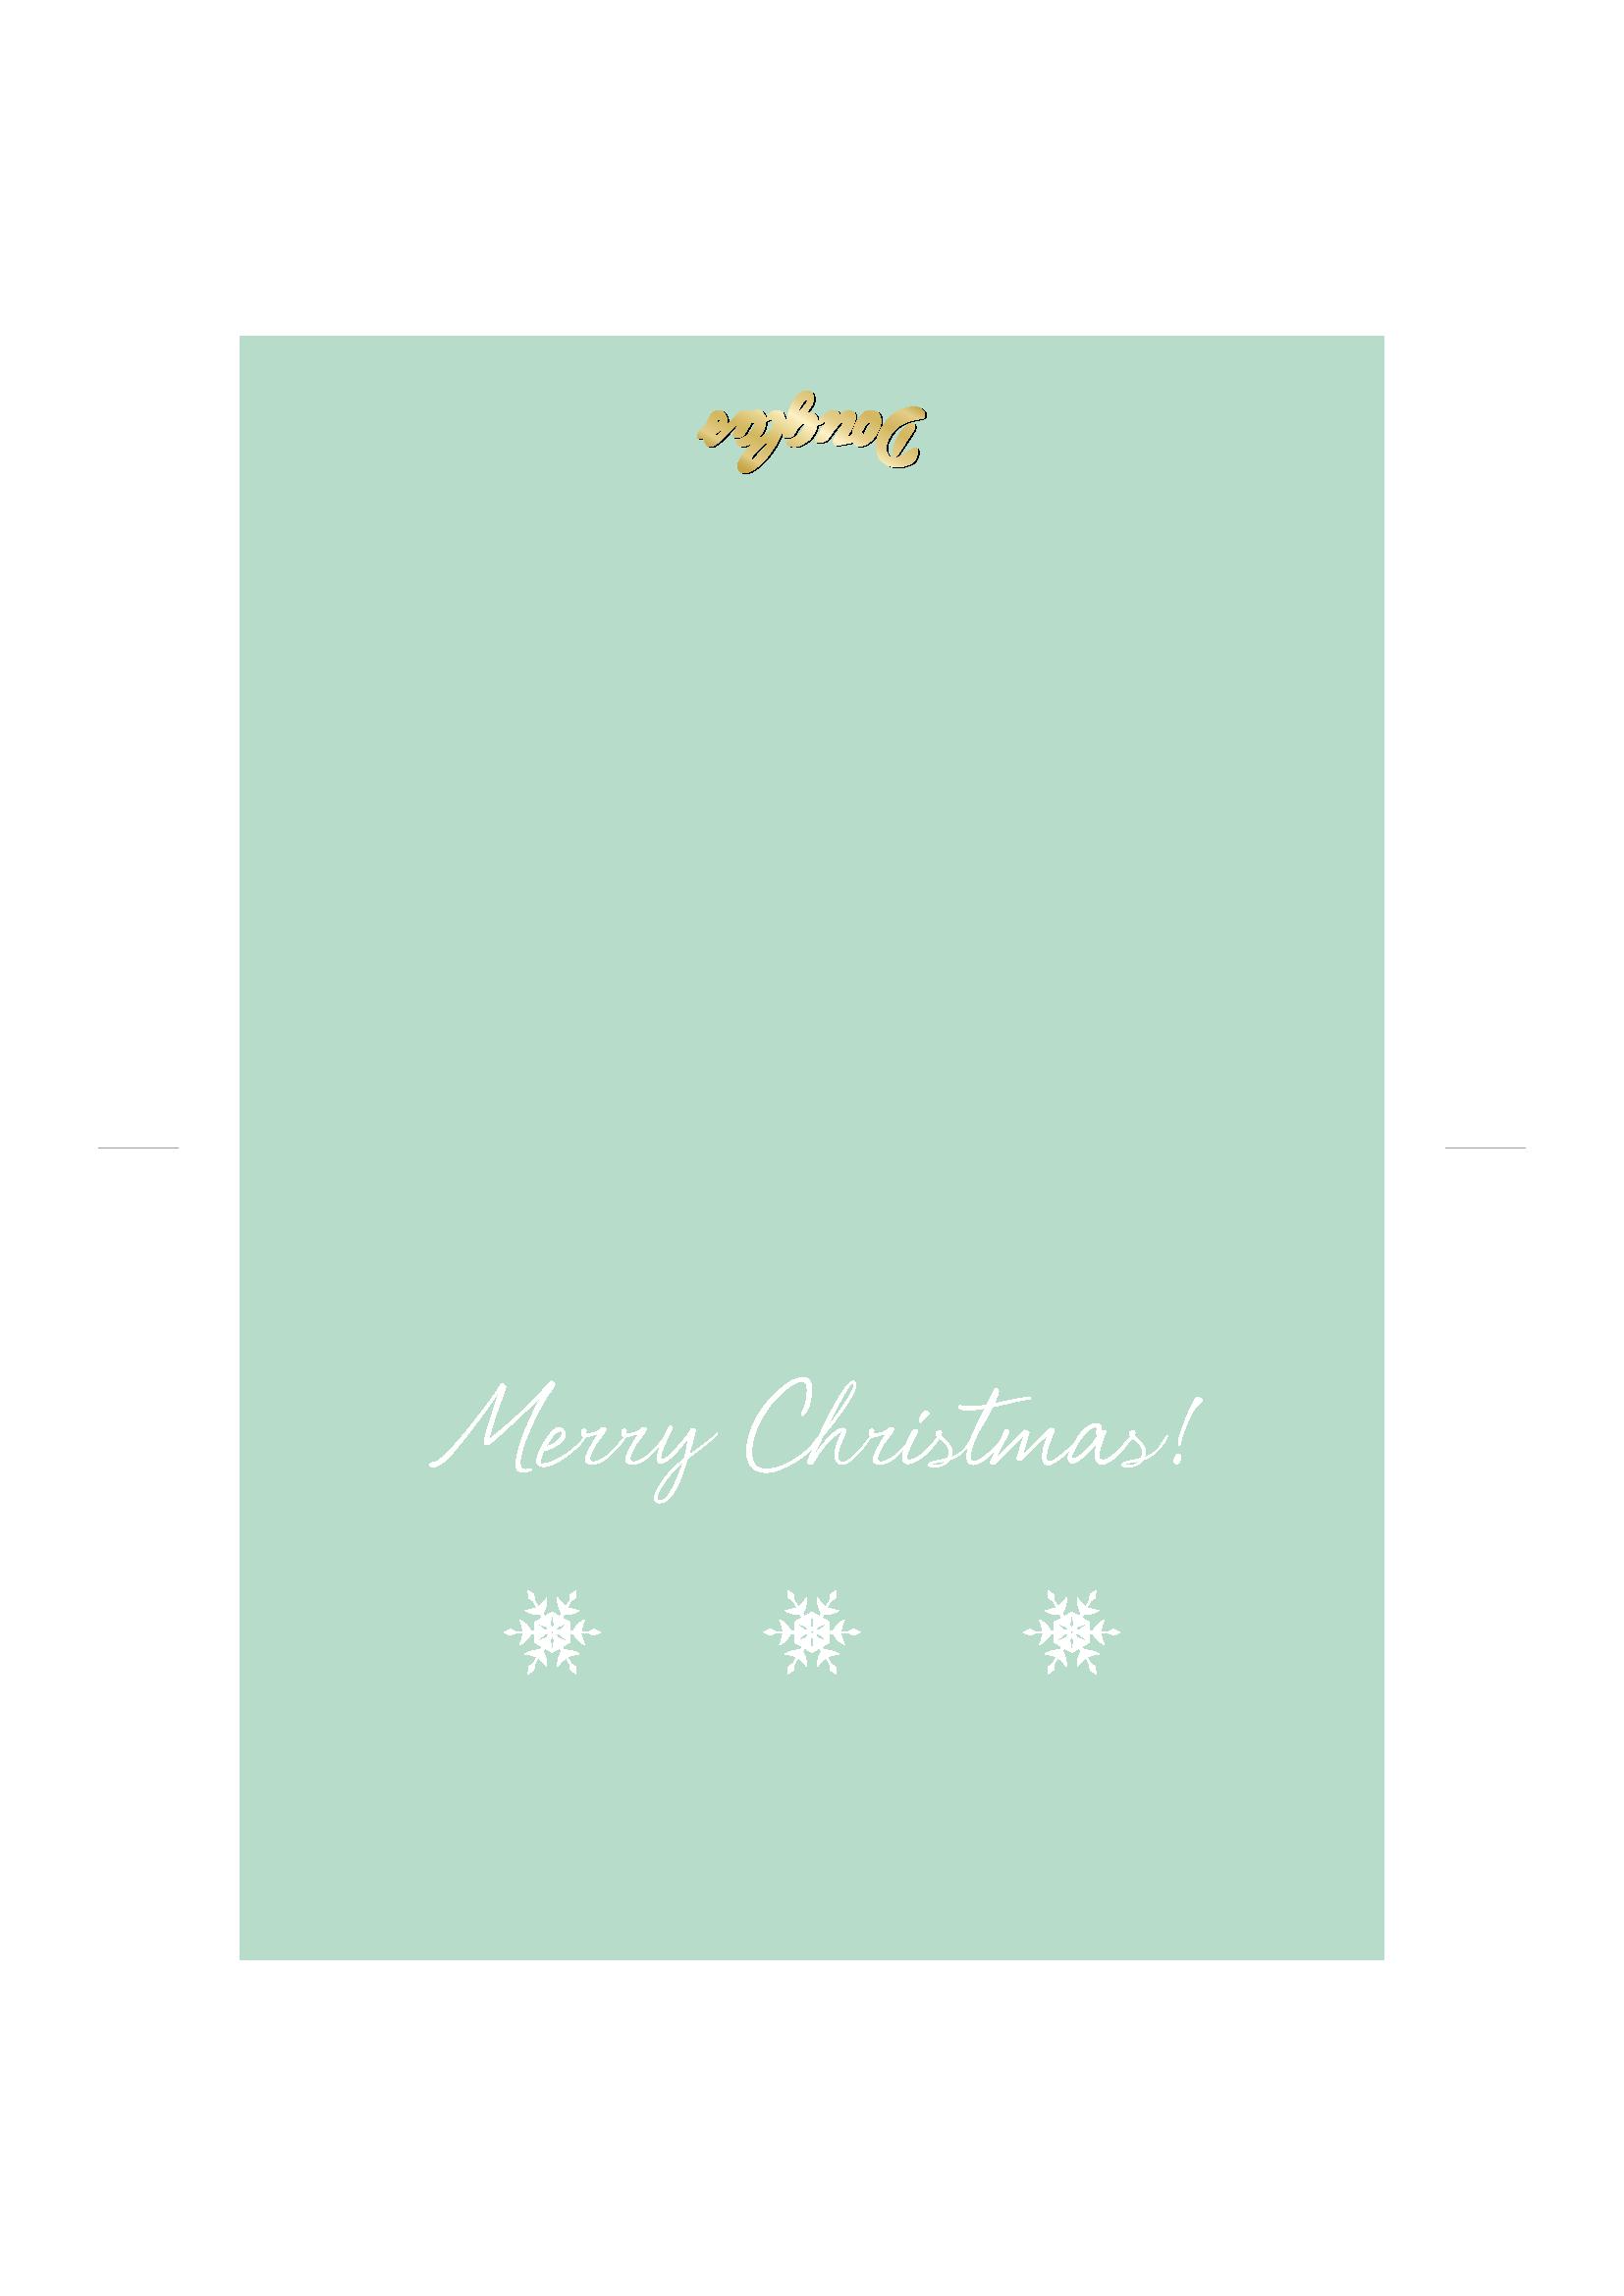 fr deine lieben als free printables auf douglasde chritsmas cards for your